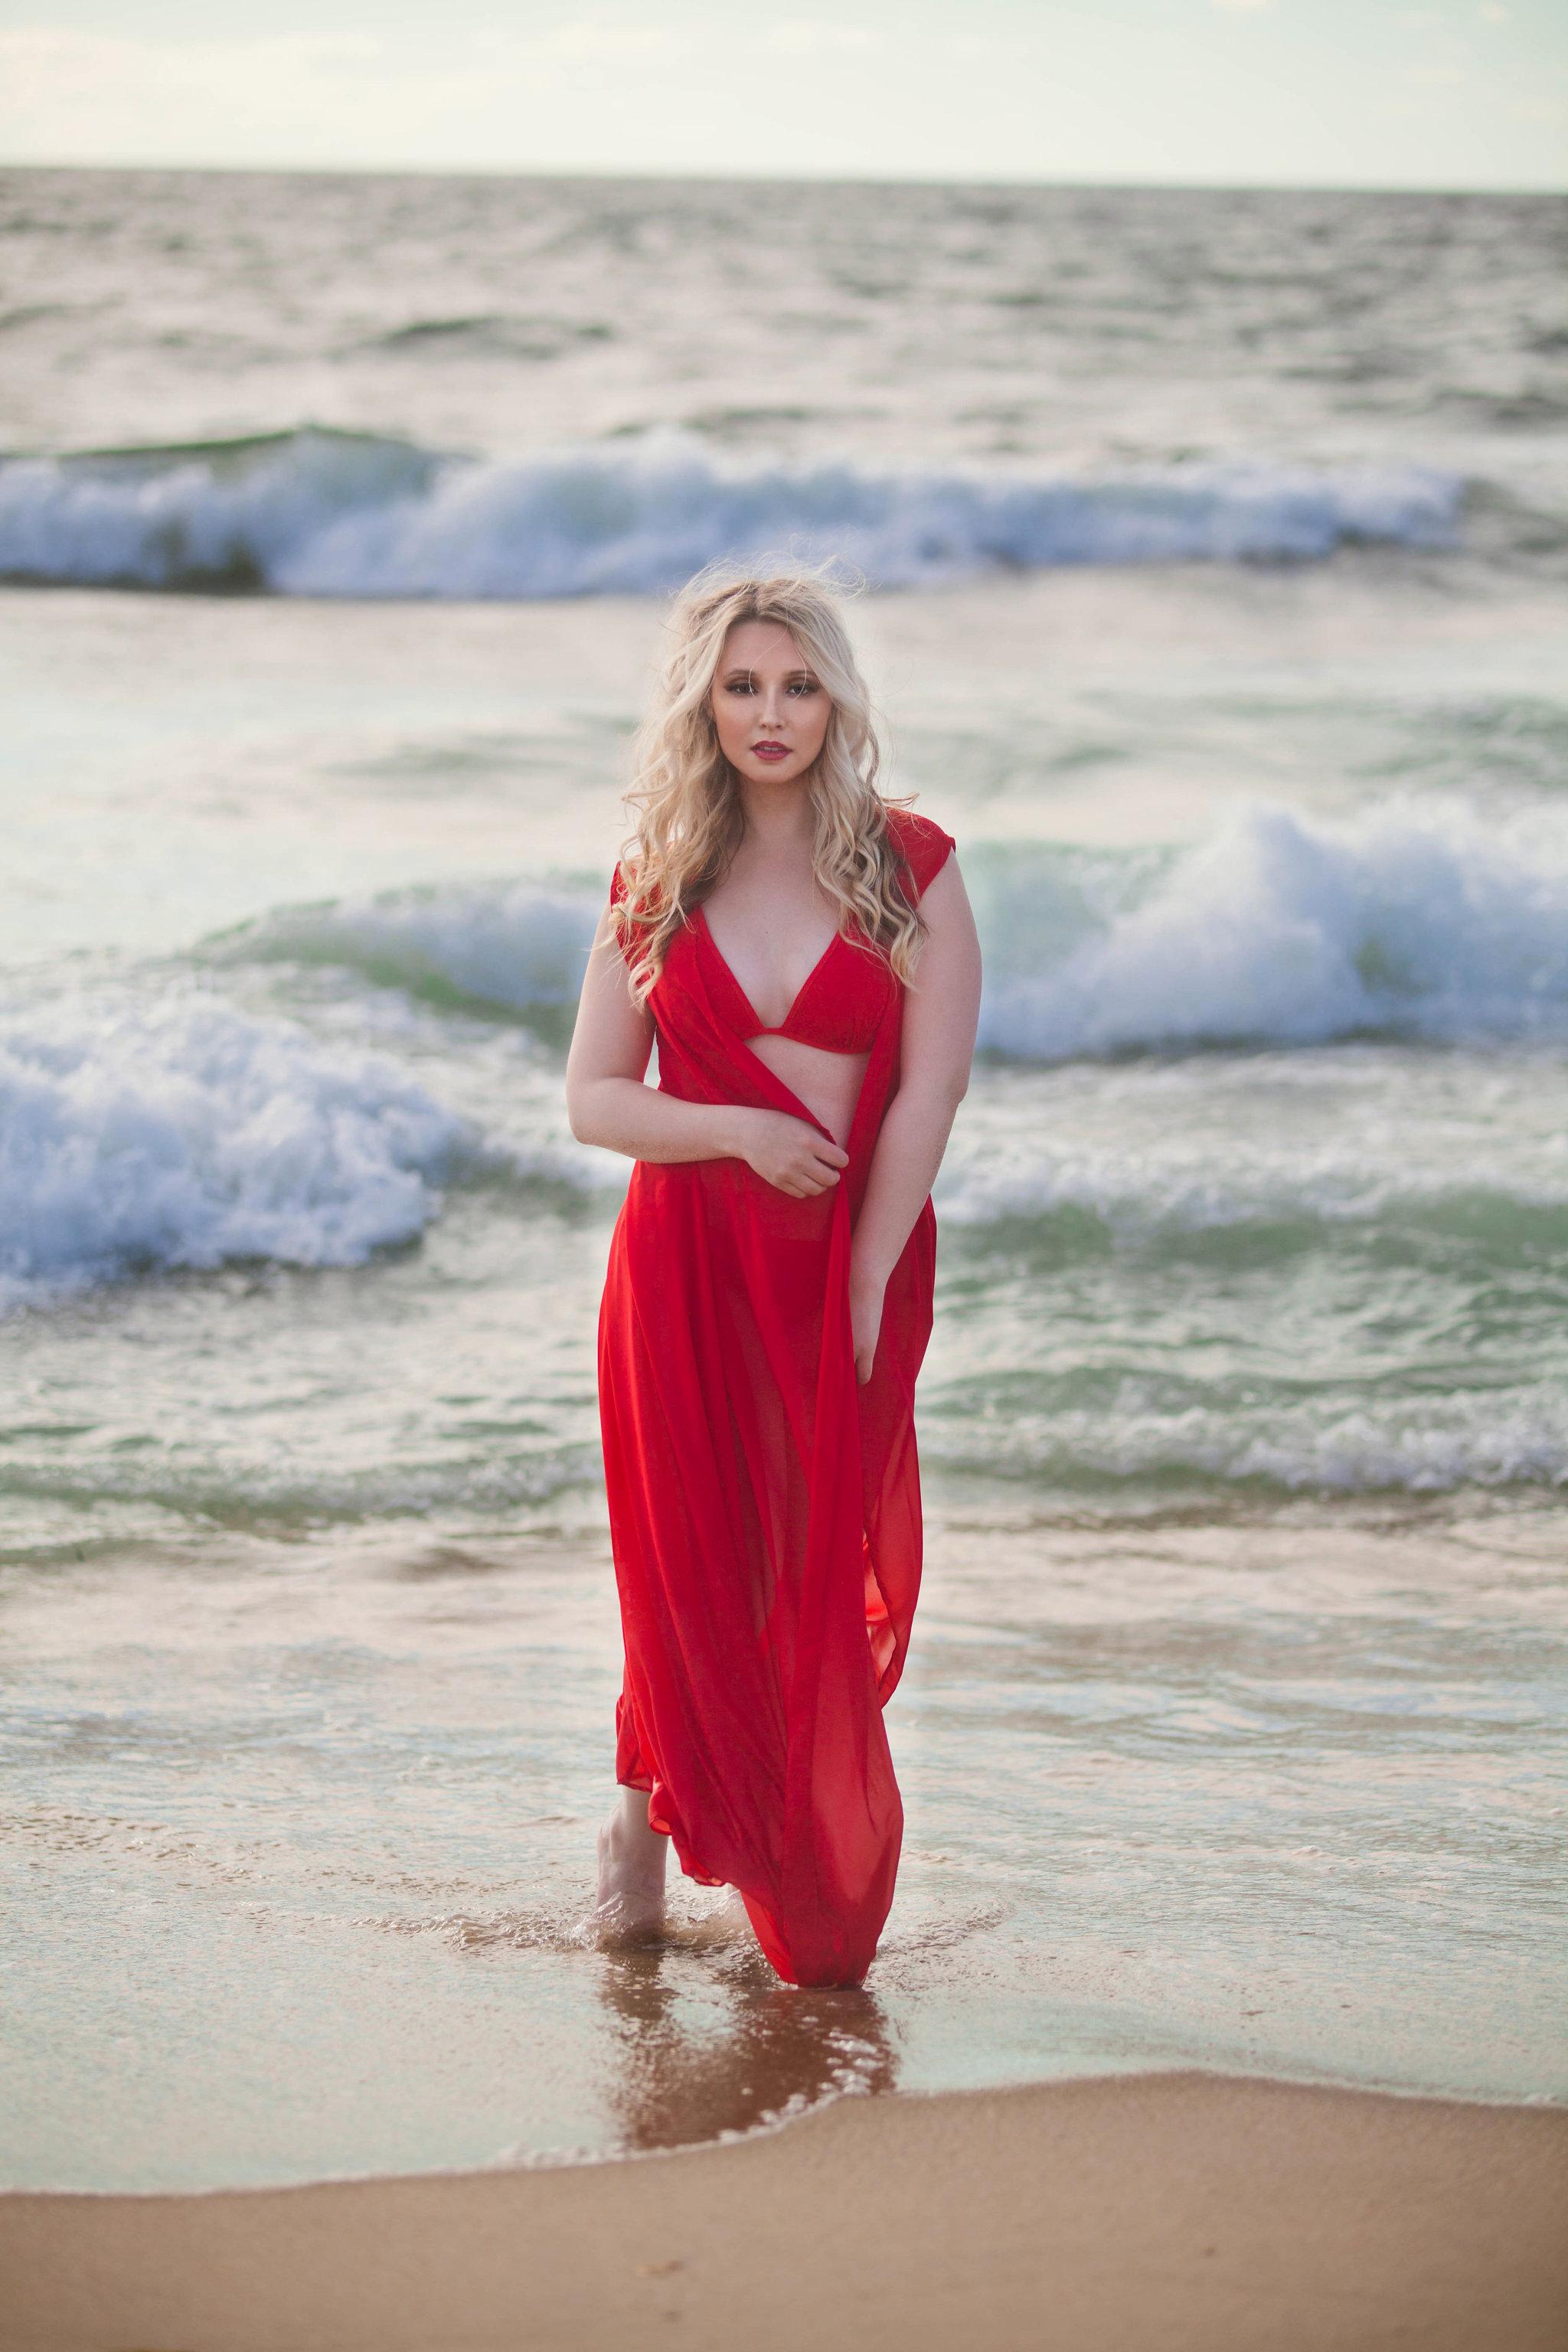 Alli_Sunrise_Beach_LongBranch-3290_pp.jpg